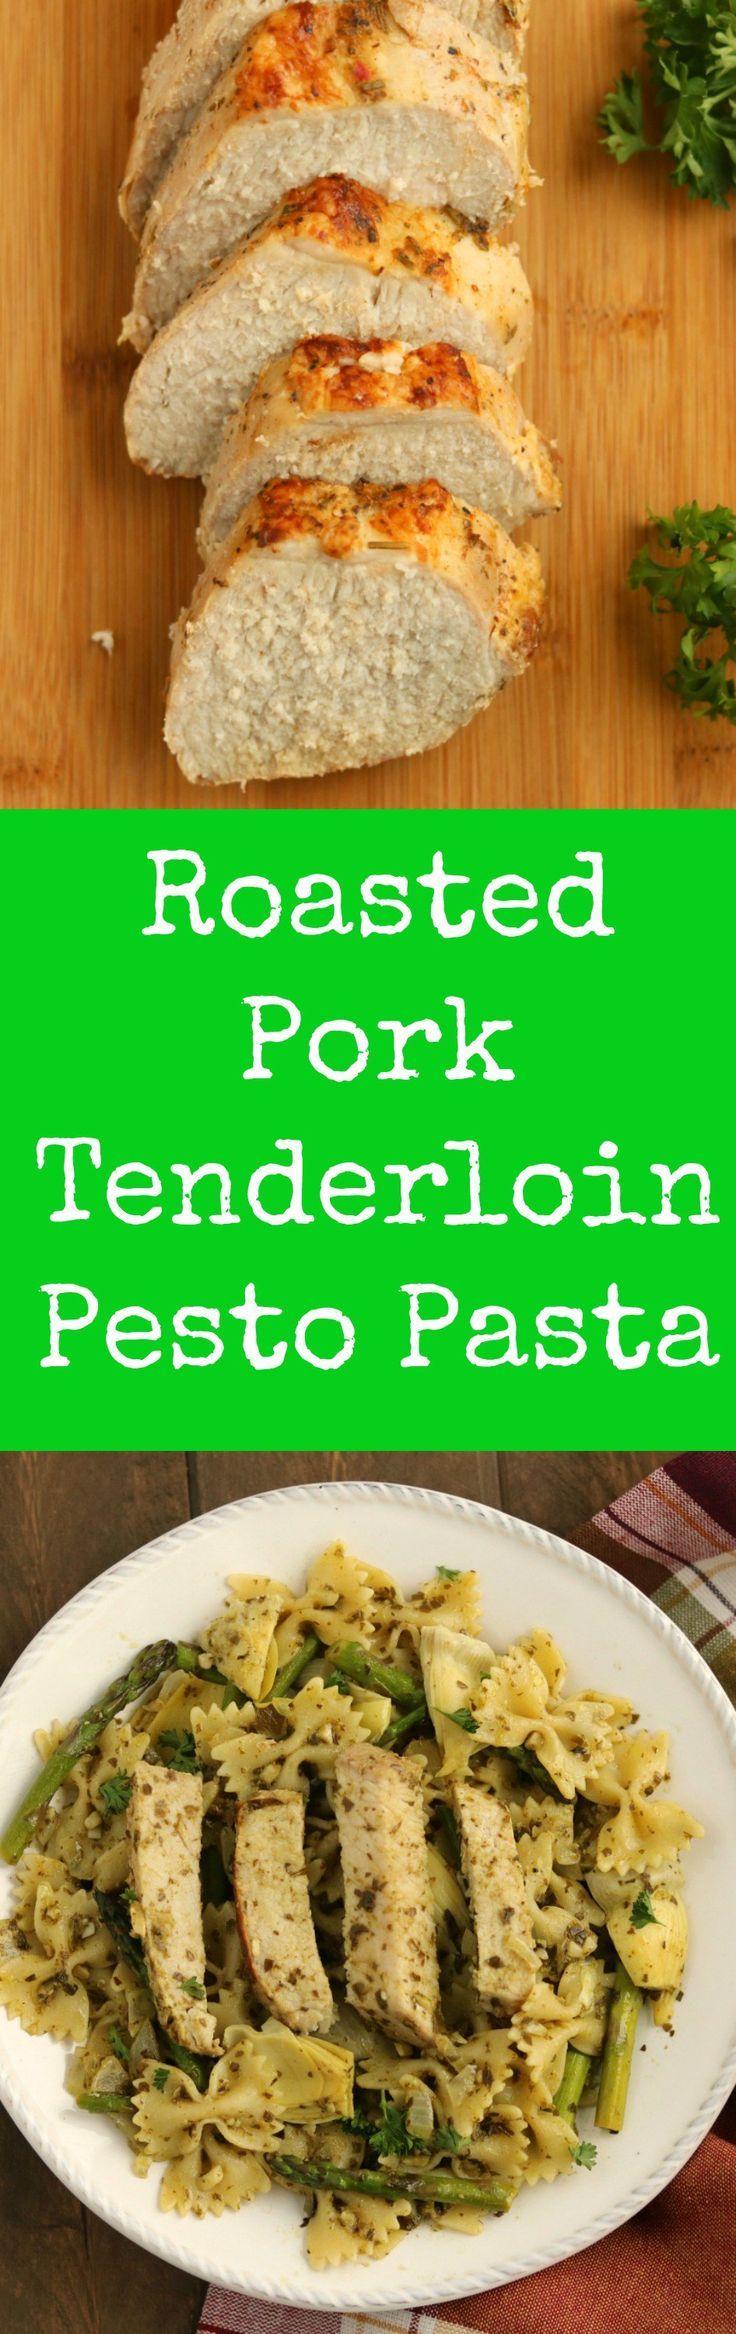 pork tenderloin pesto pasta #ad #RealFlavorRealFast @Smithfieldfoods @Walmart